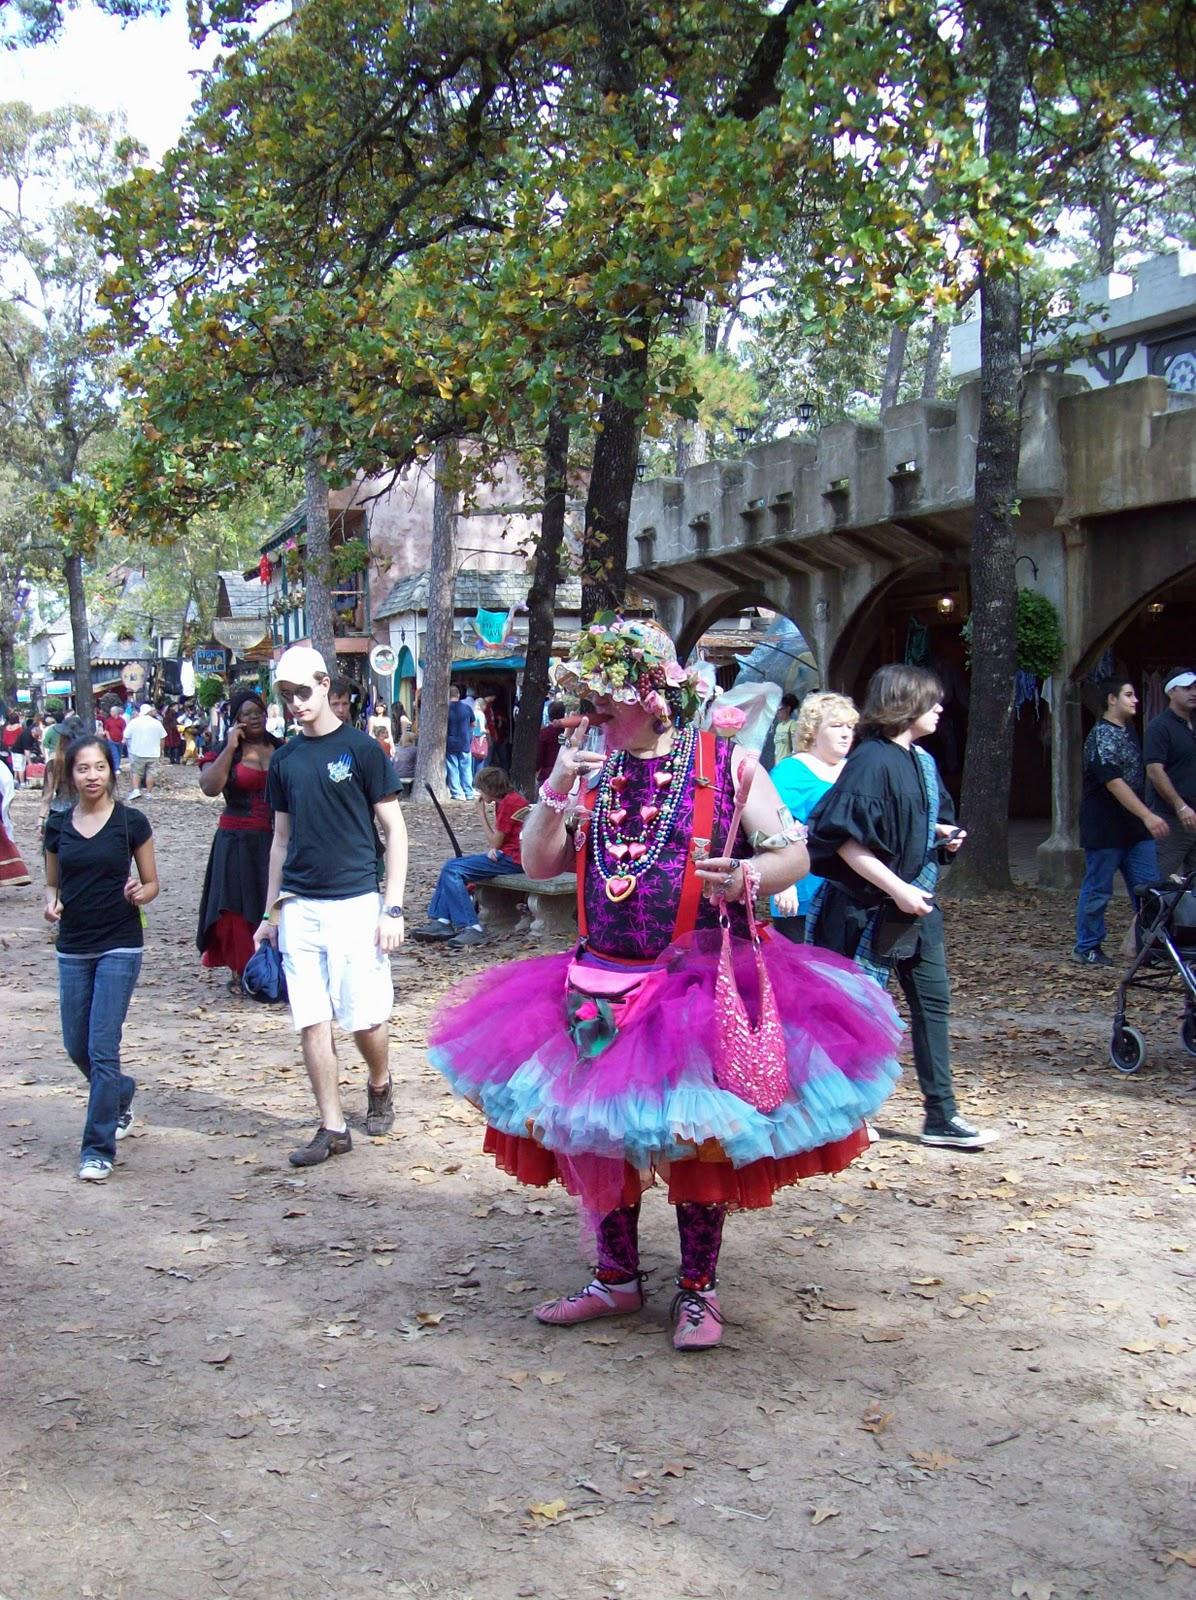 Texas Renaissance Festival - 101_5779.JPG